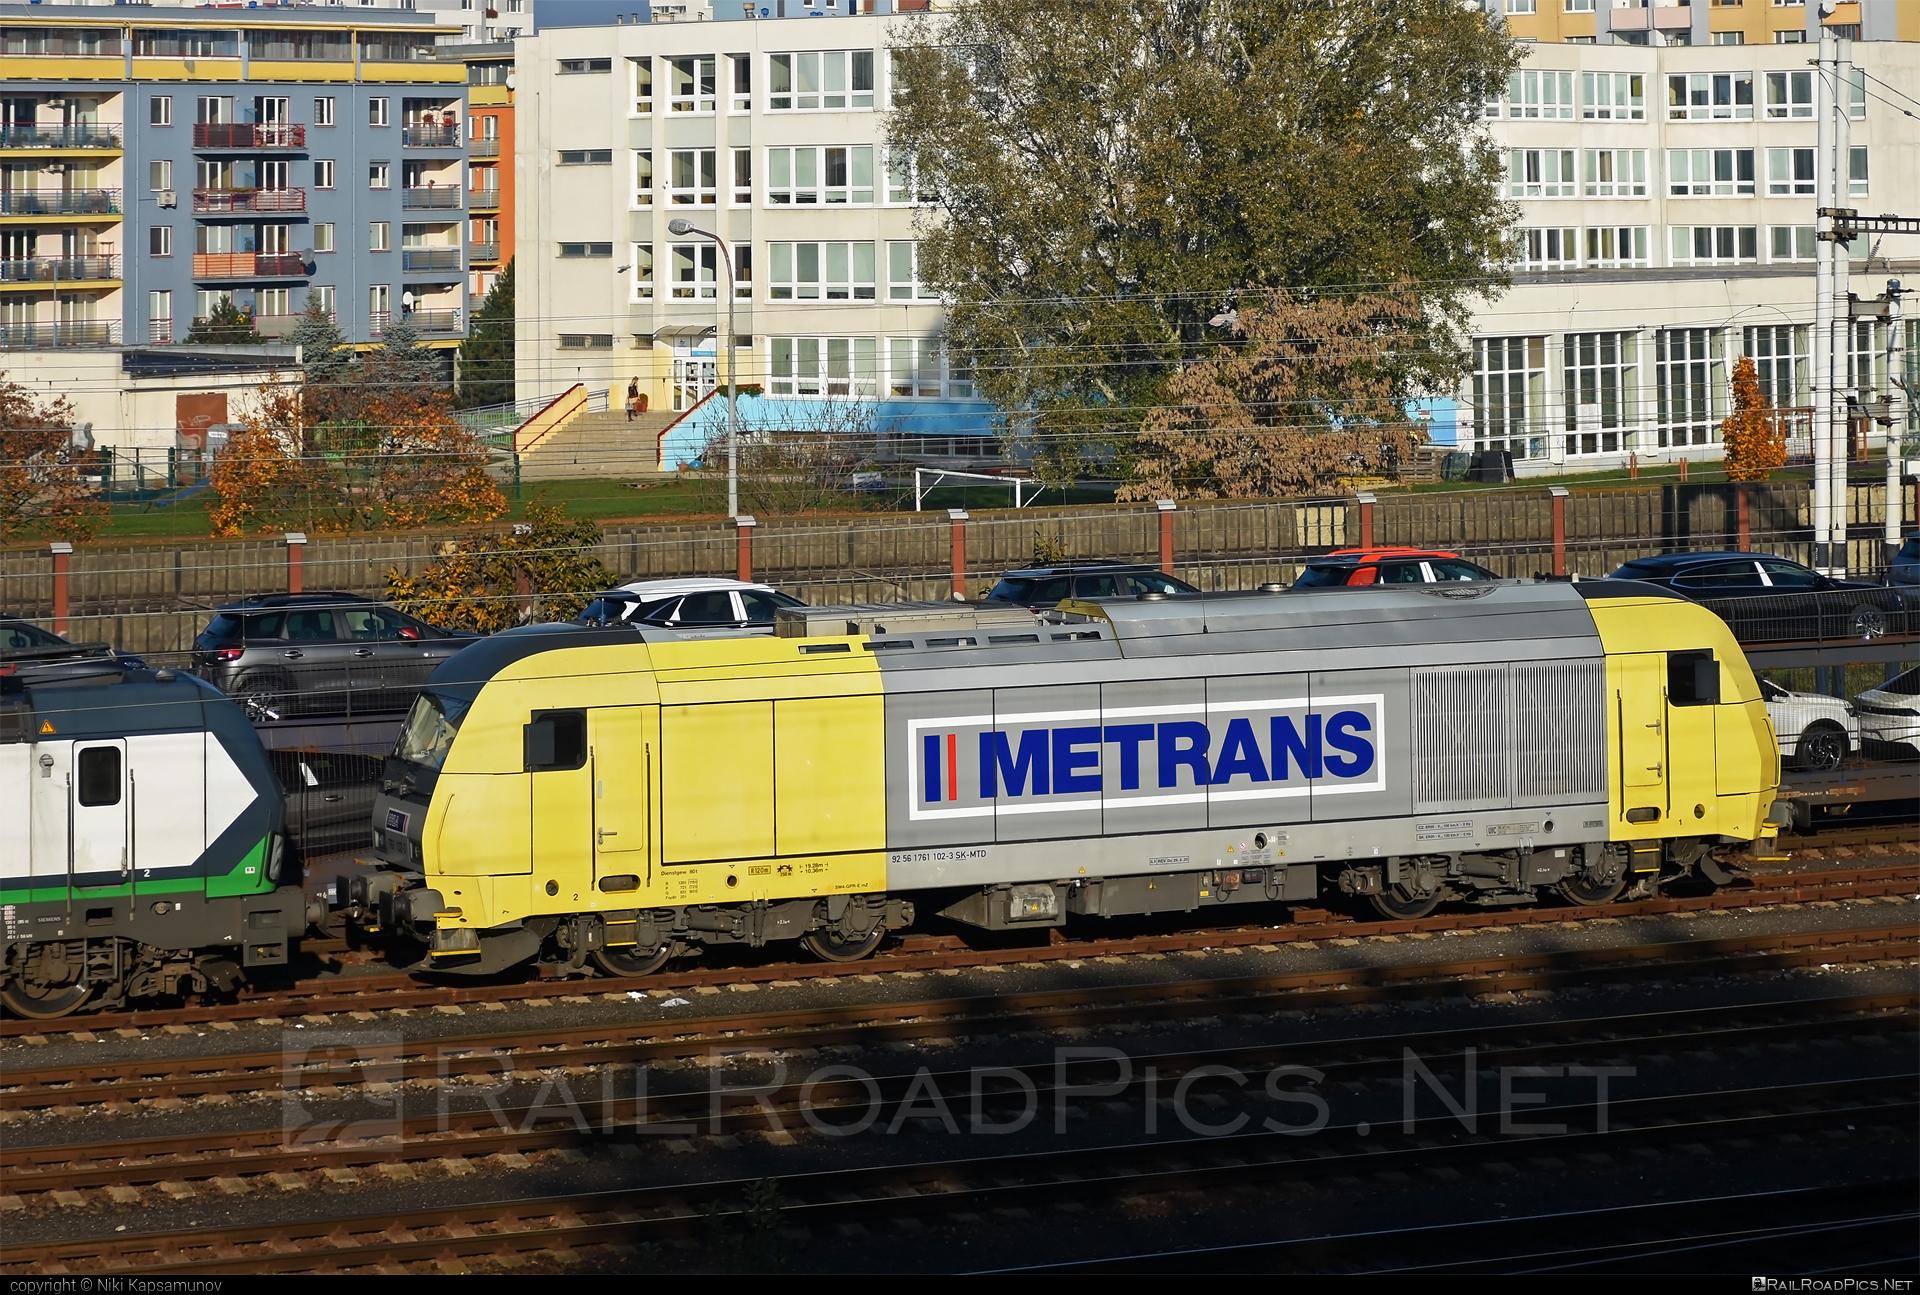 Siemens ER20 - 761 102-3 operated by METRANS (Danubia) a.s. #er20 #er20hercules #eurorunner #hhla #metrans #metransdanubia #siemens #siemenser20 #siemenser20hercules #siemenseurorunner #siemenshercules